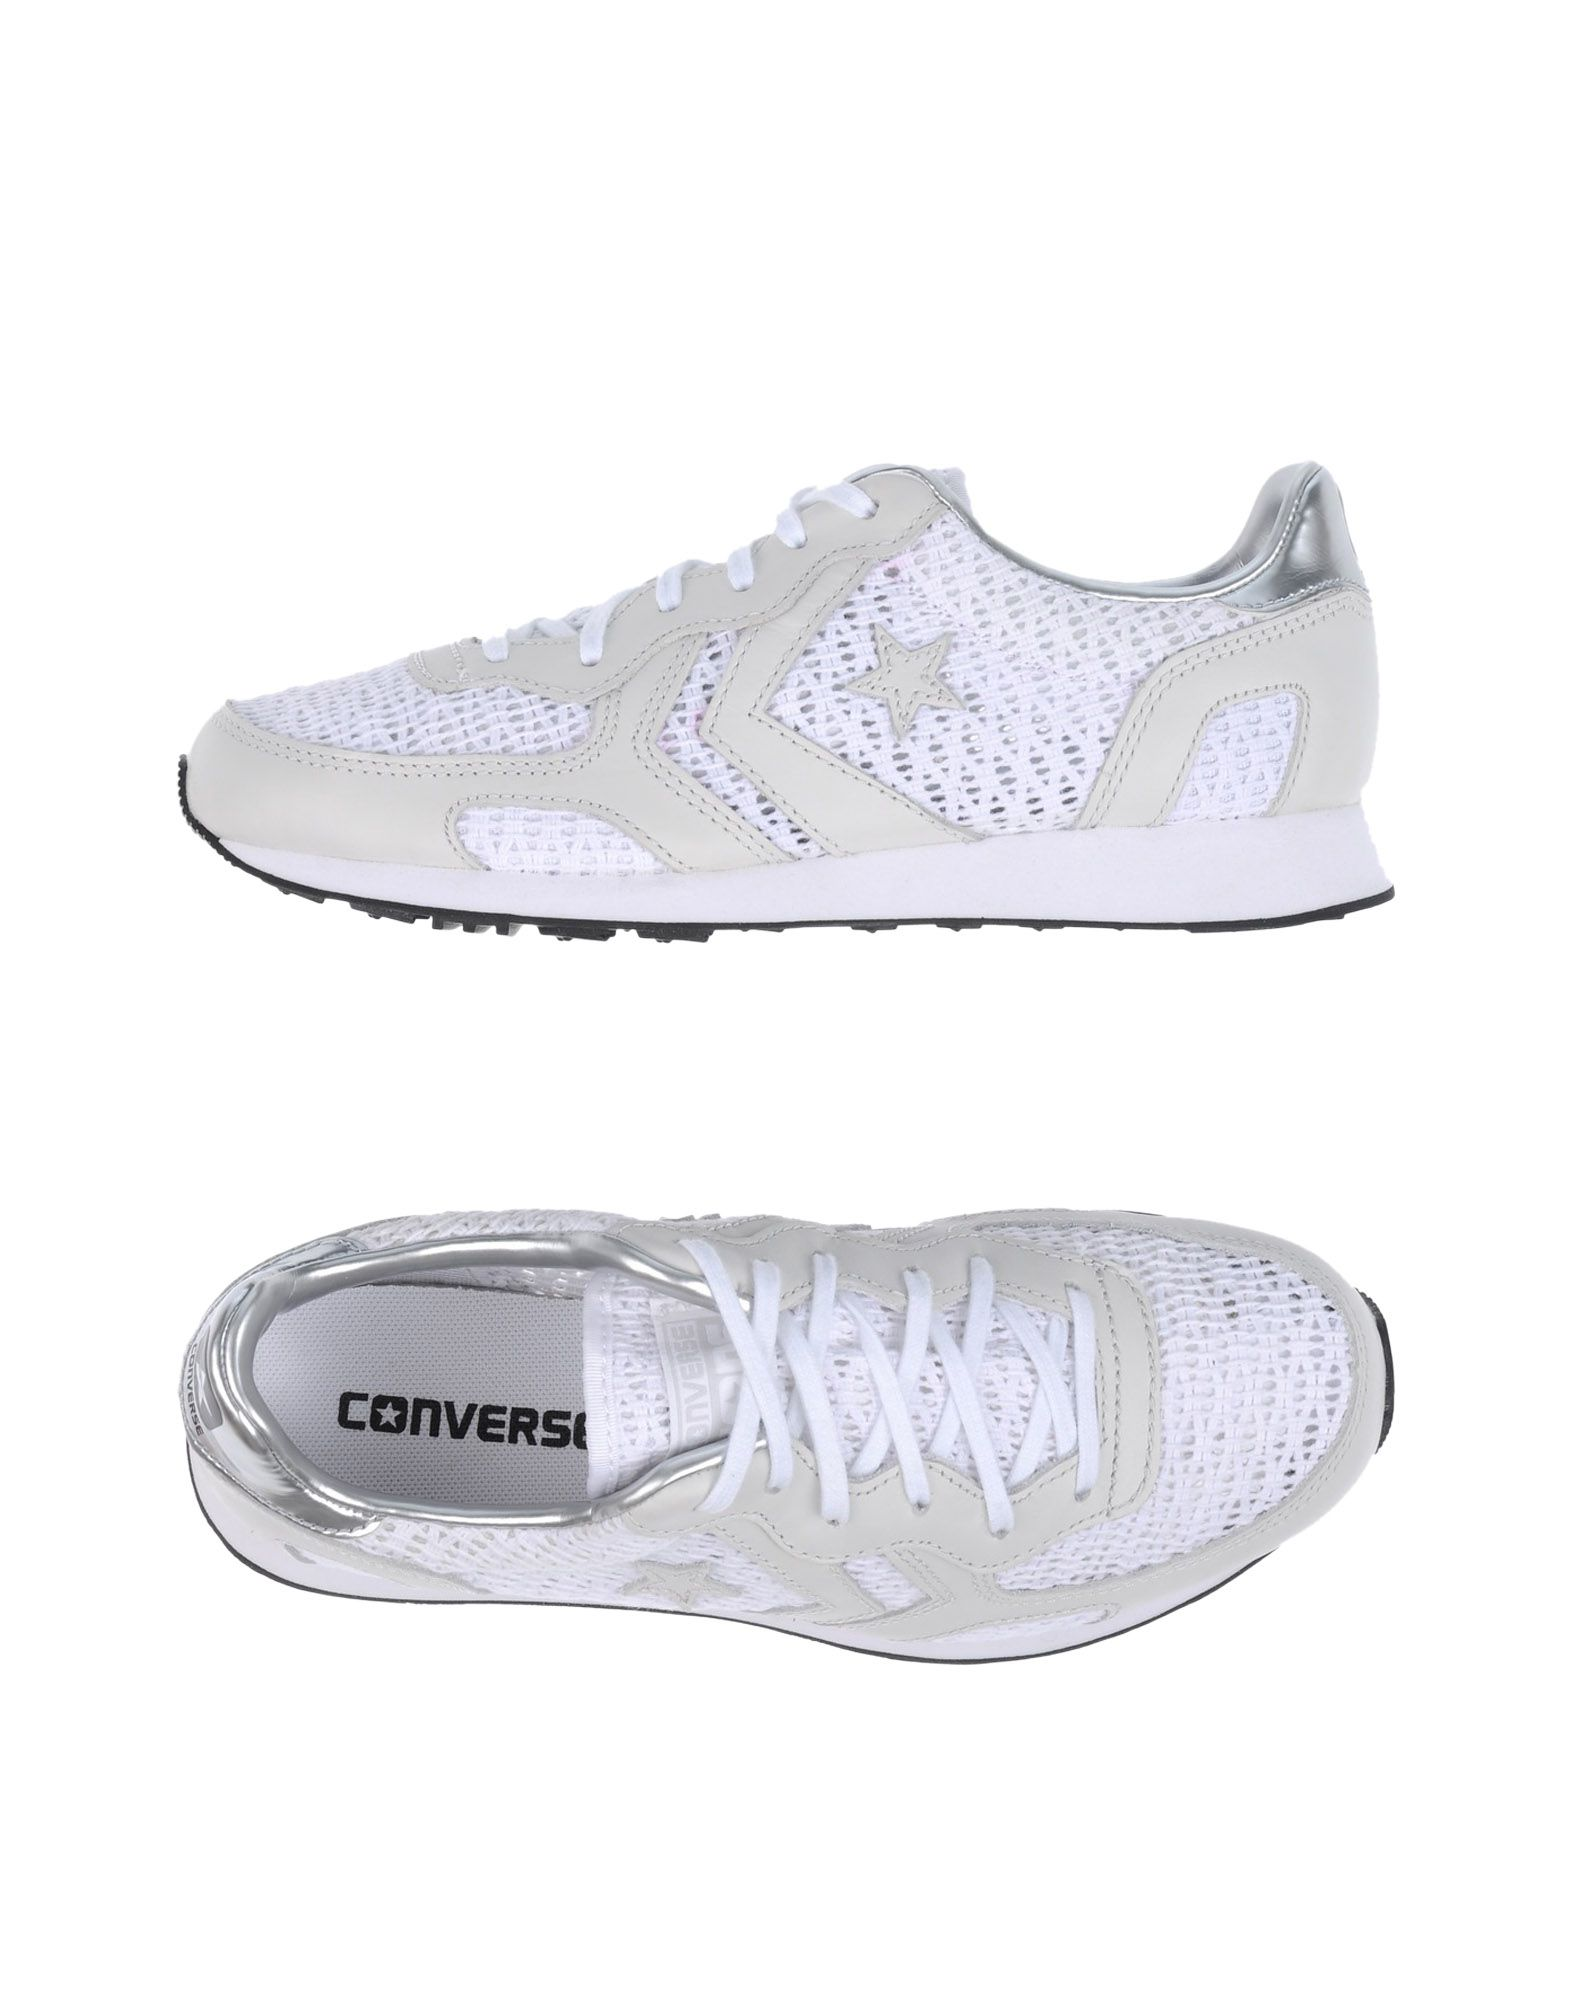 Sneakers Converse Cons Femme - Sneakers Converse Cons sur